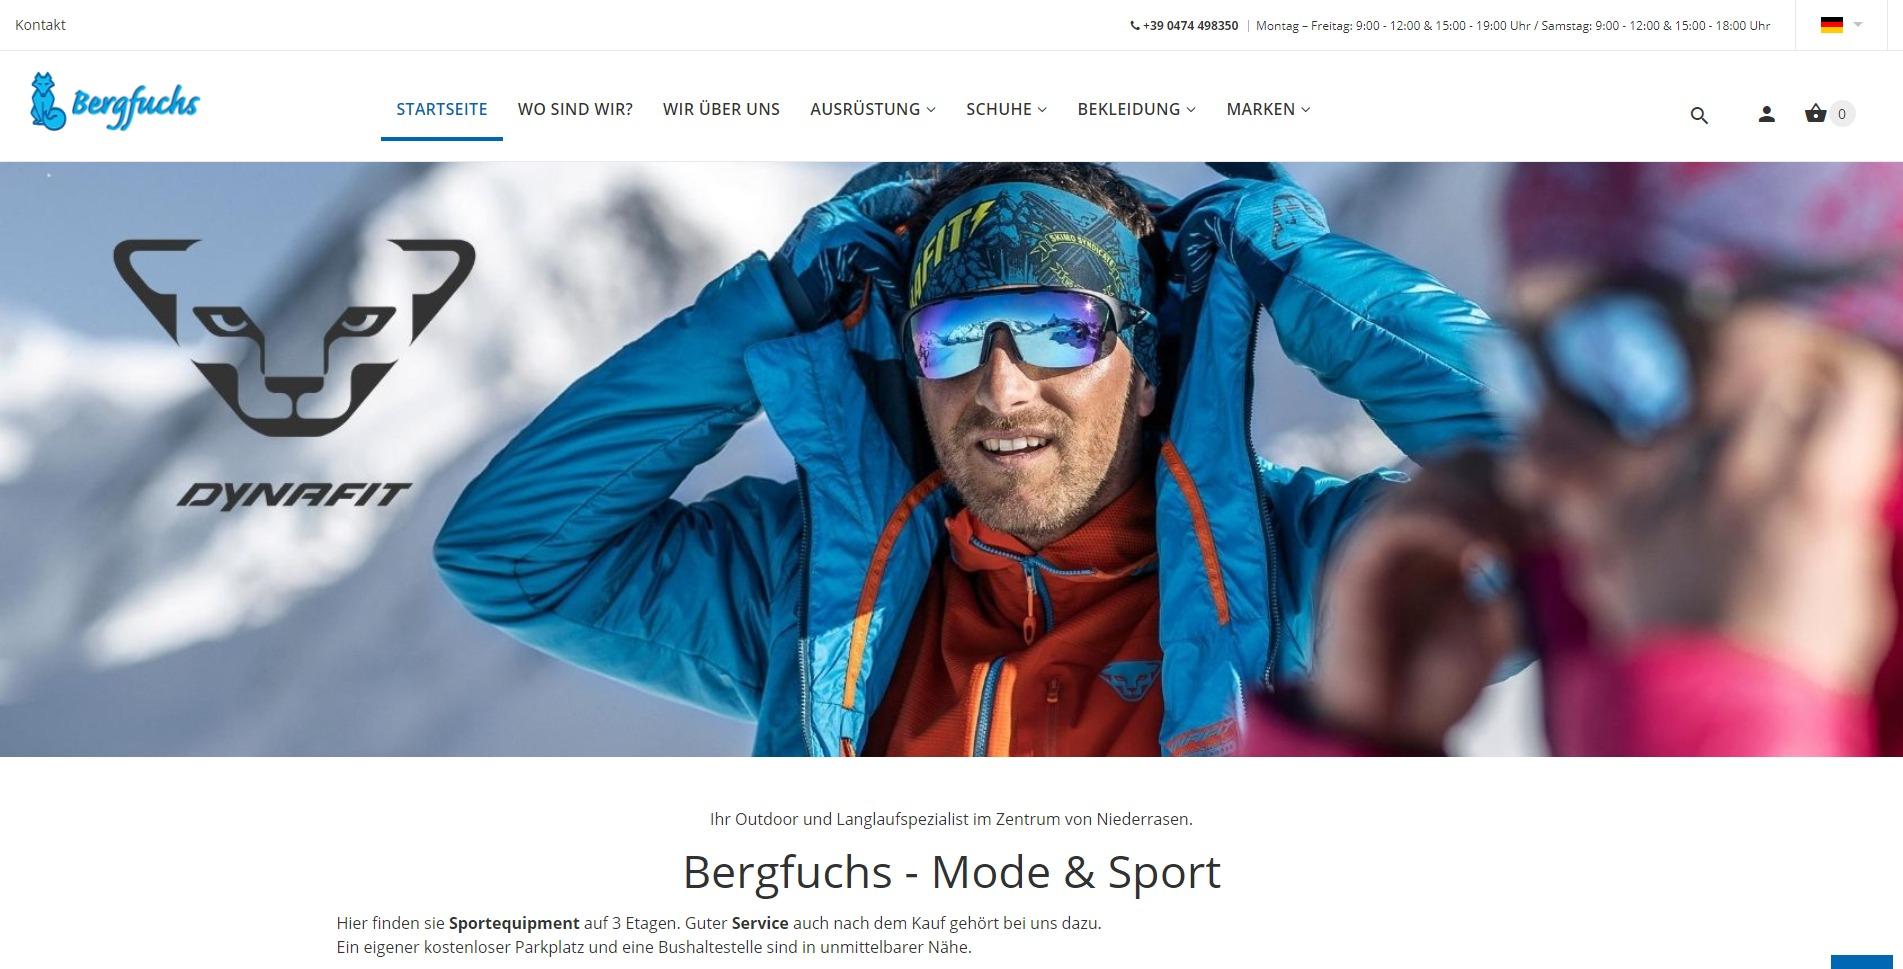 bergfuchs.com